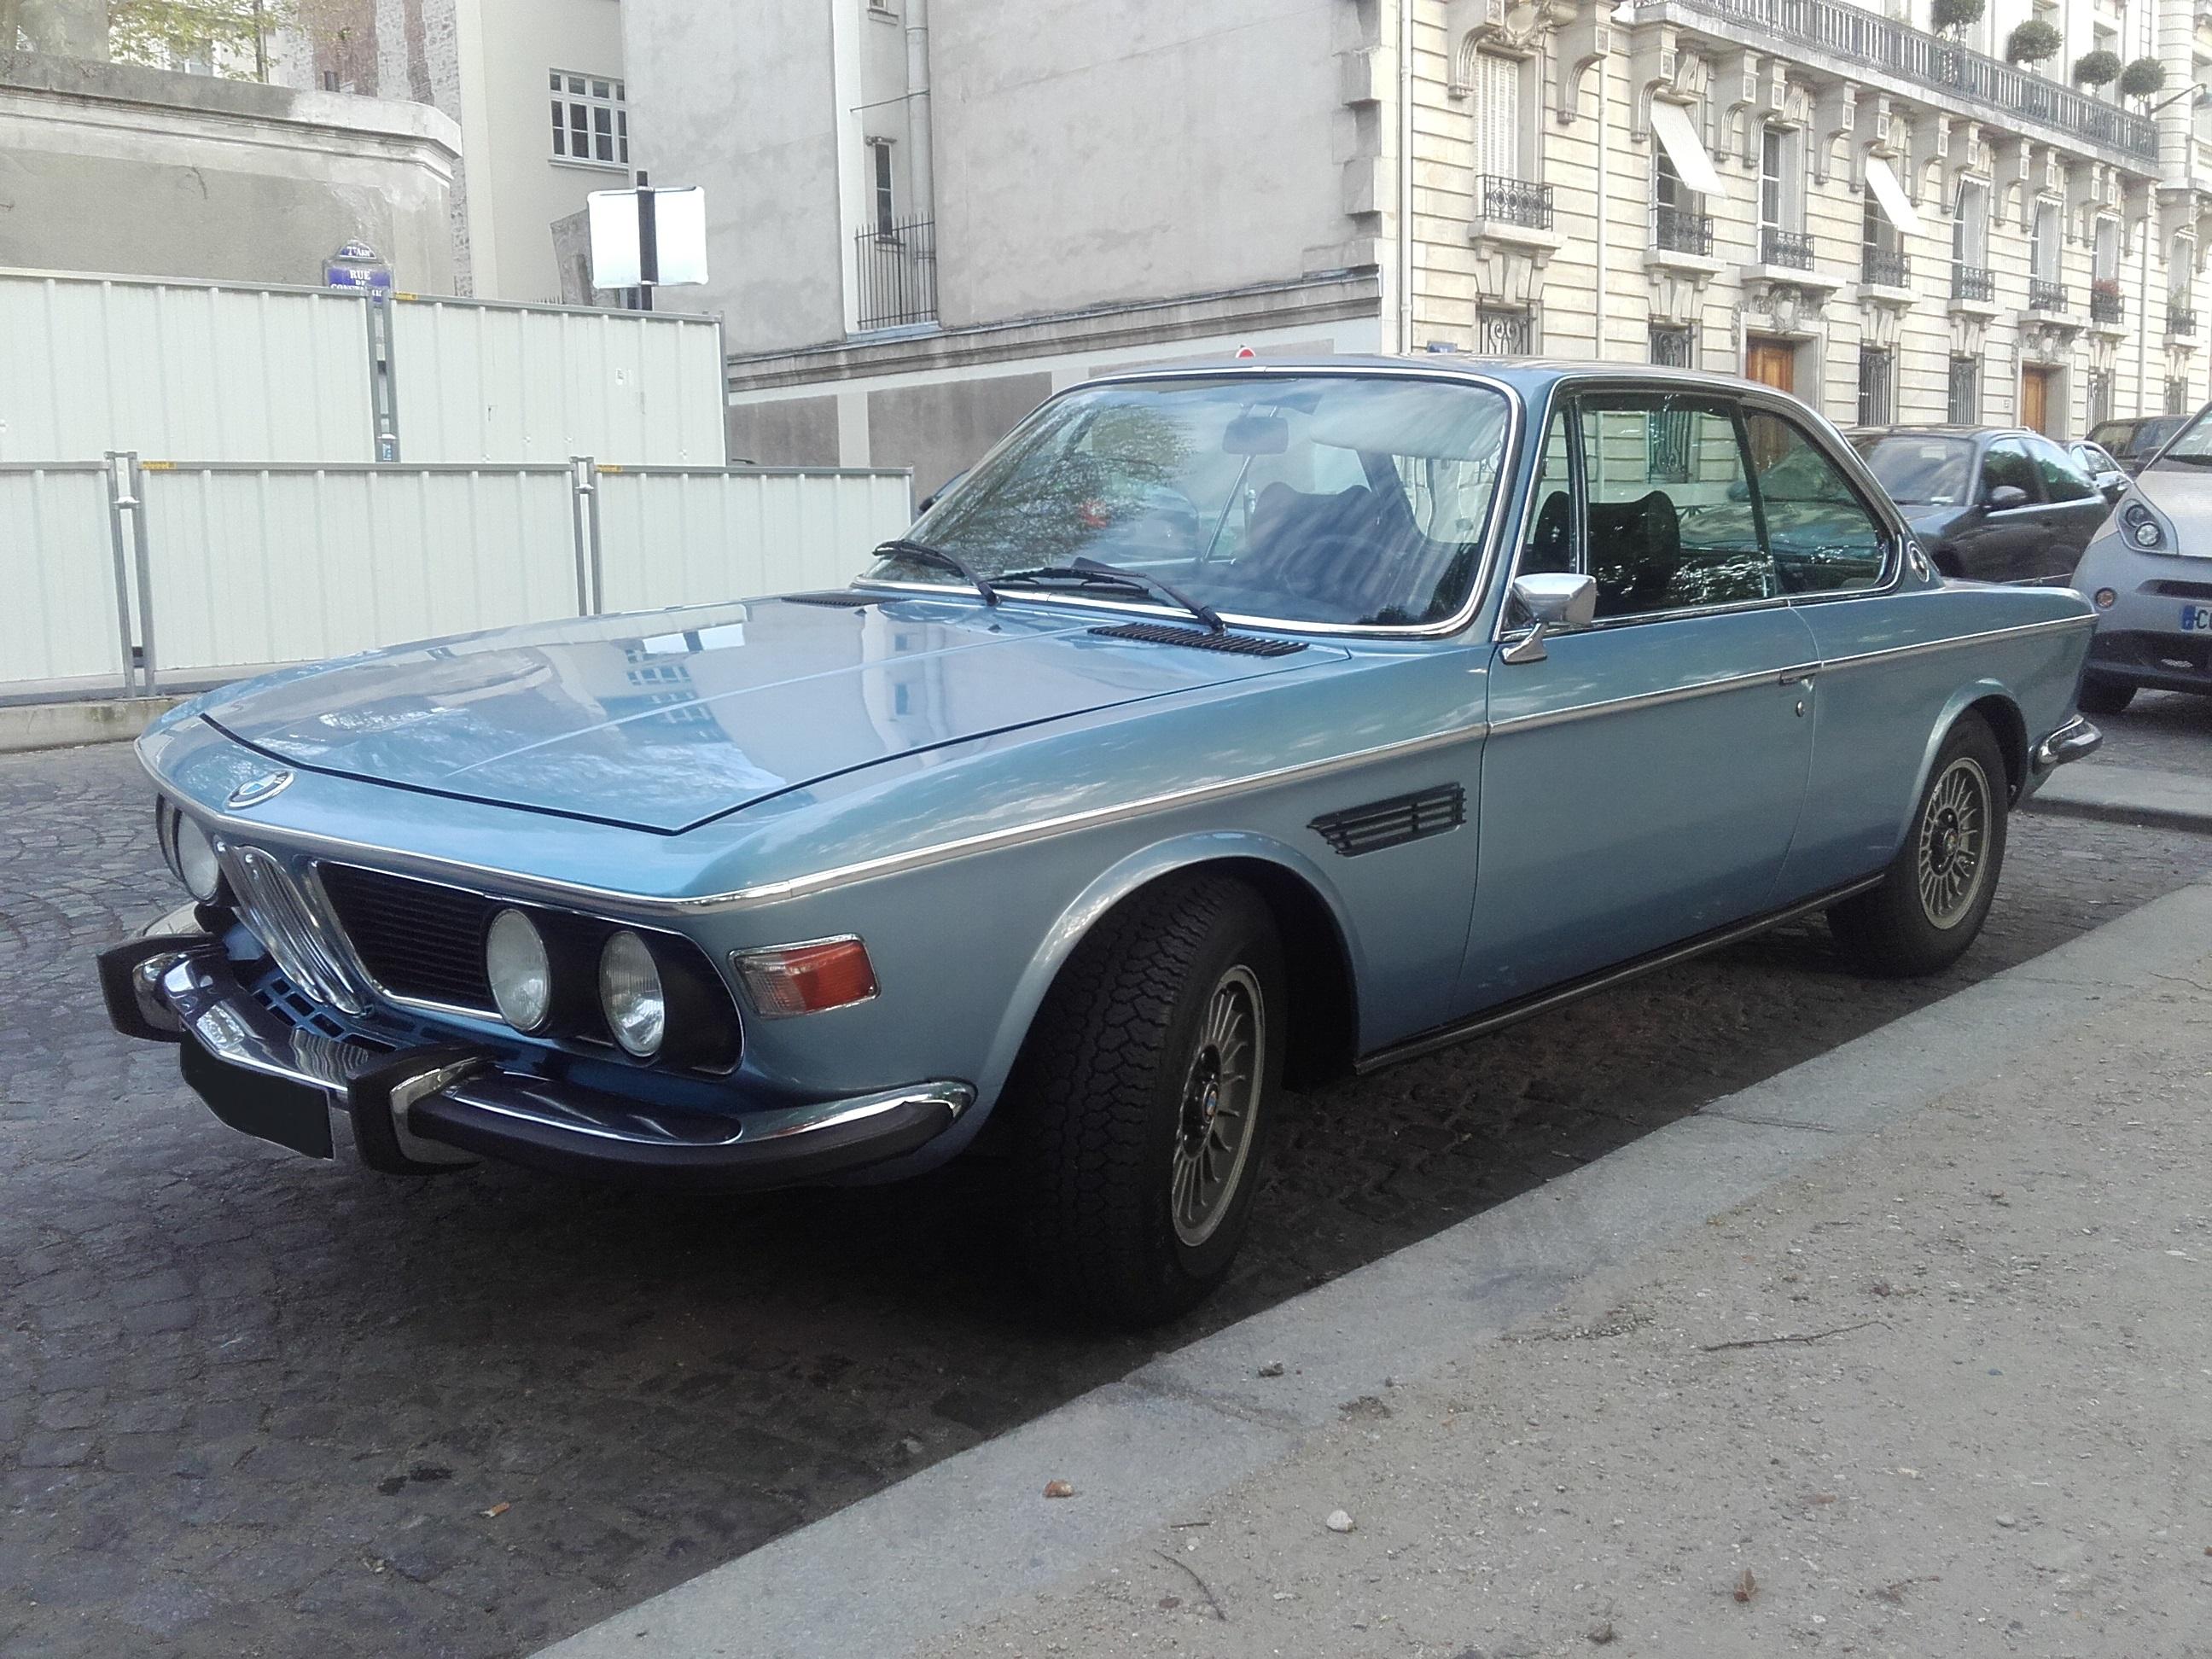 BMW 3.0 CSI.